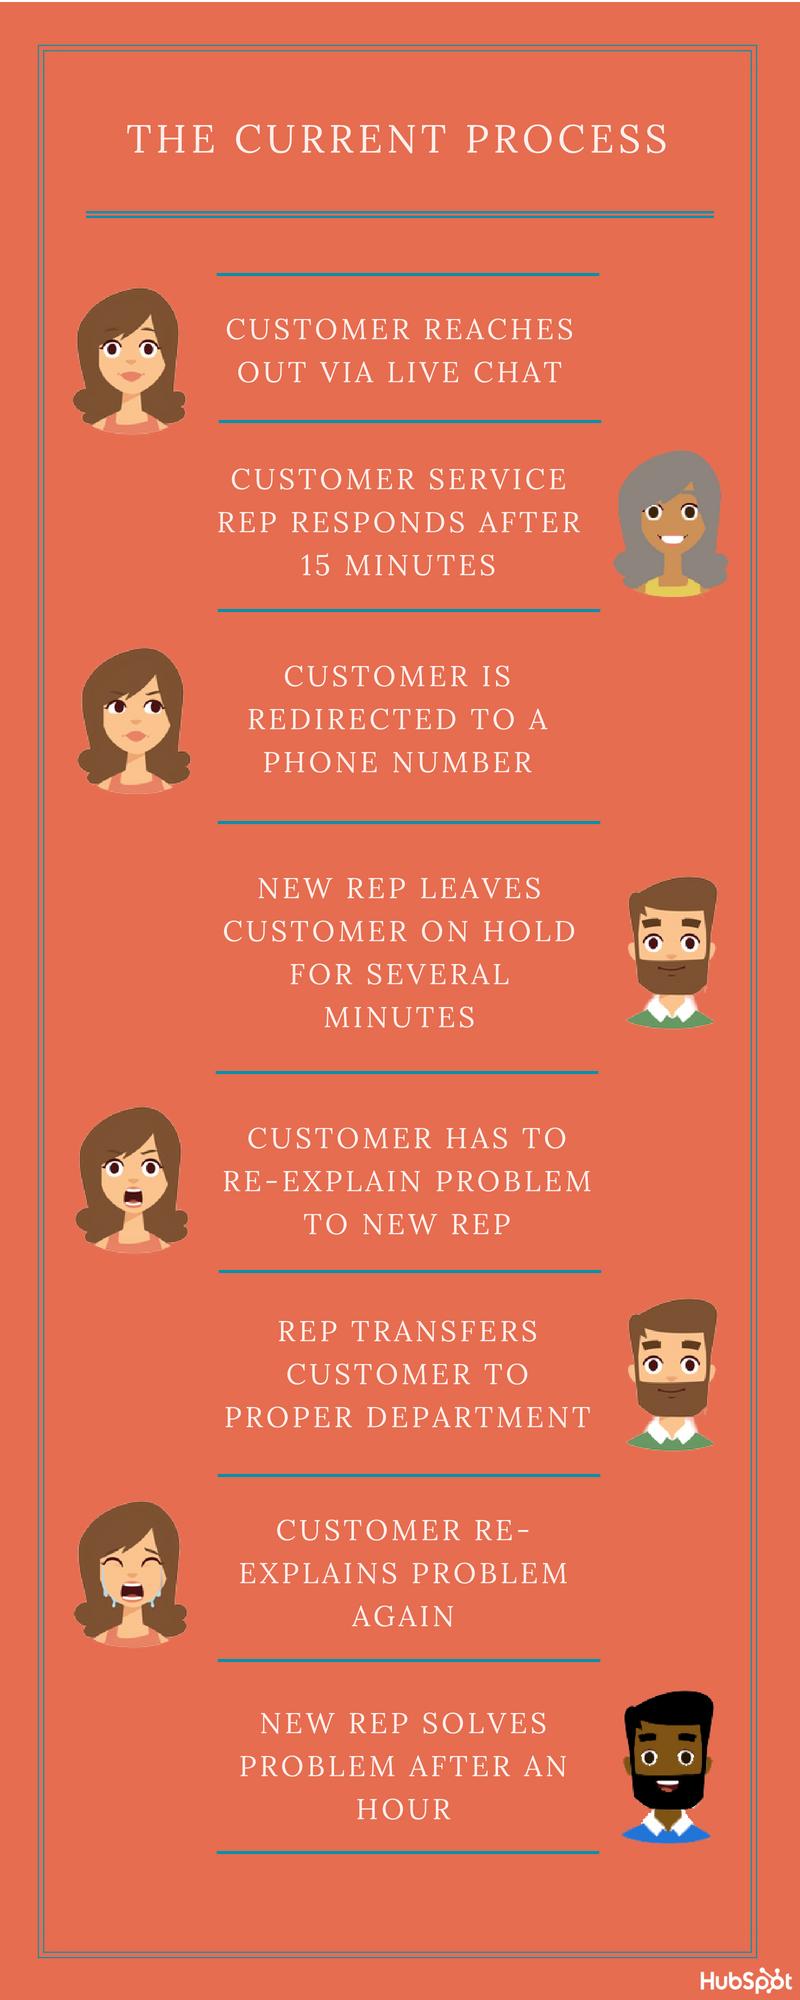 fatal-flaw-customer-service2-1